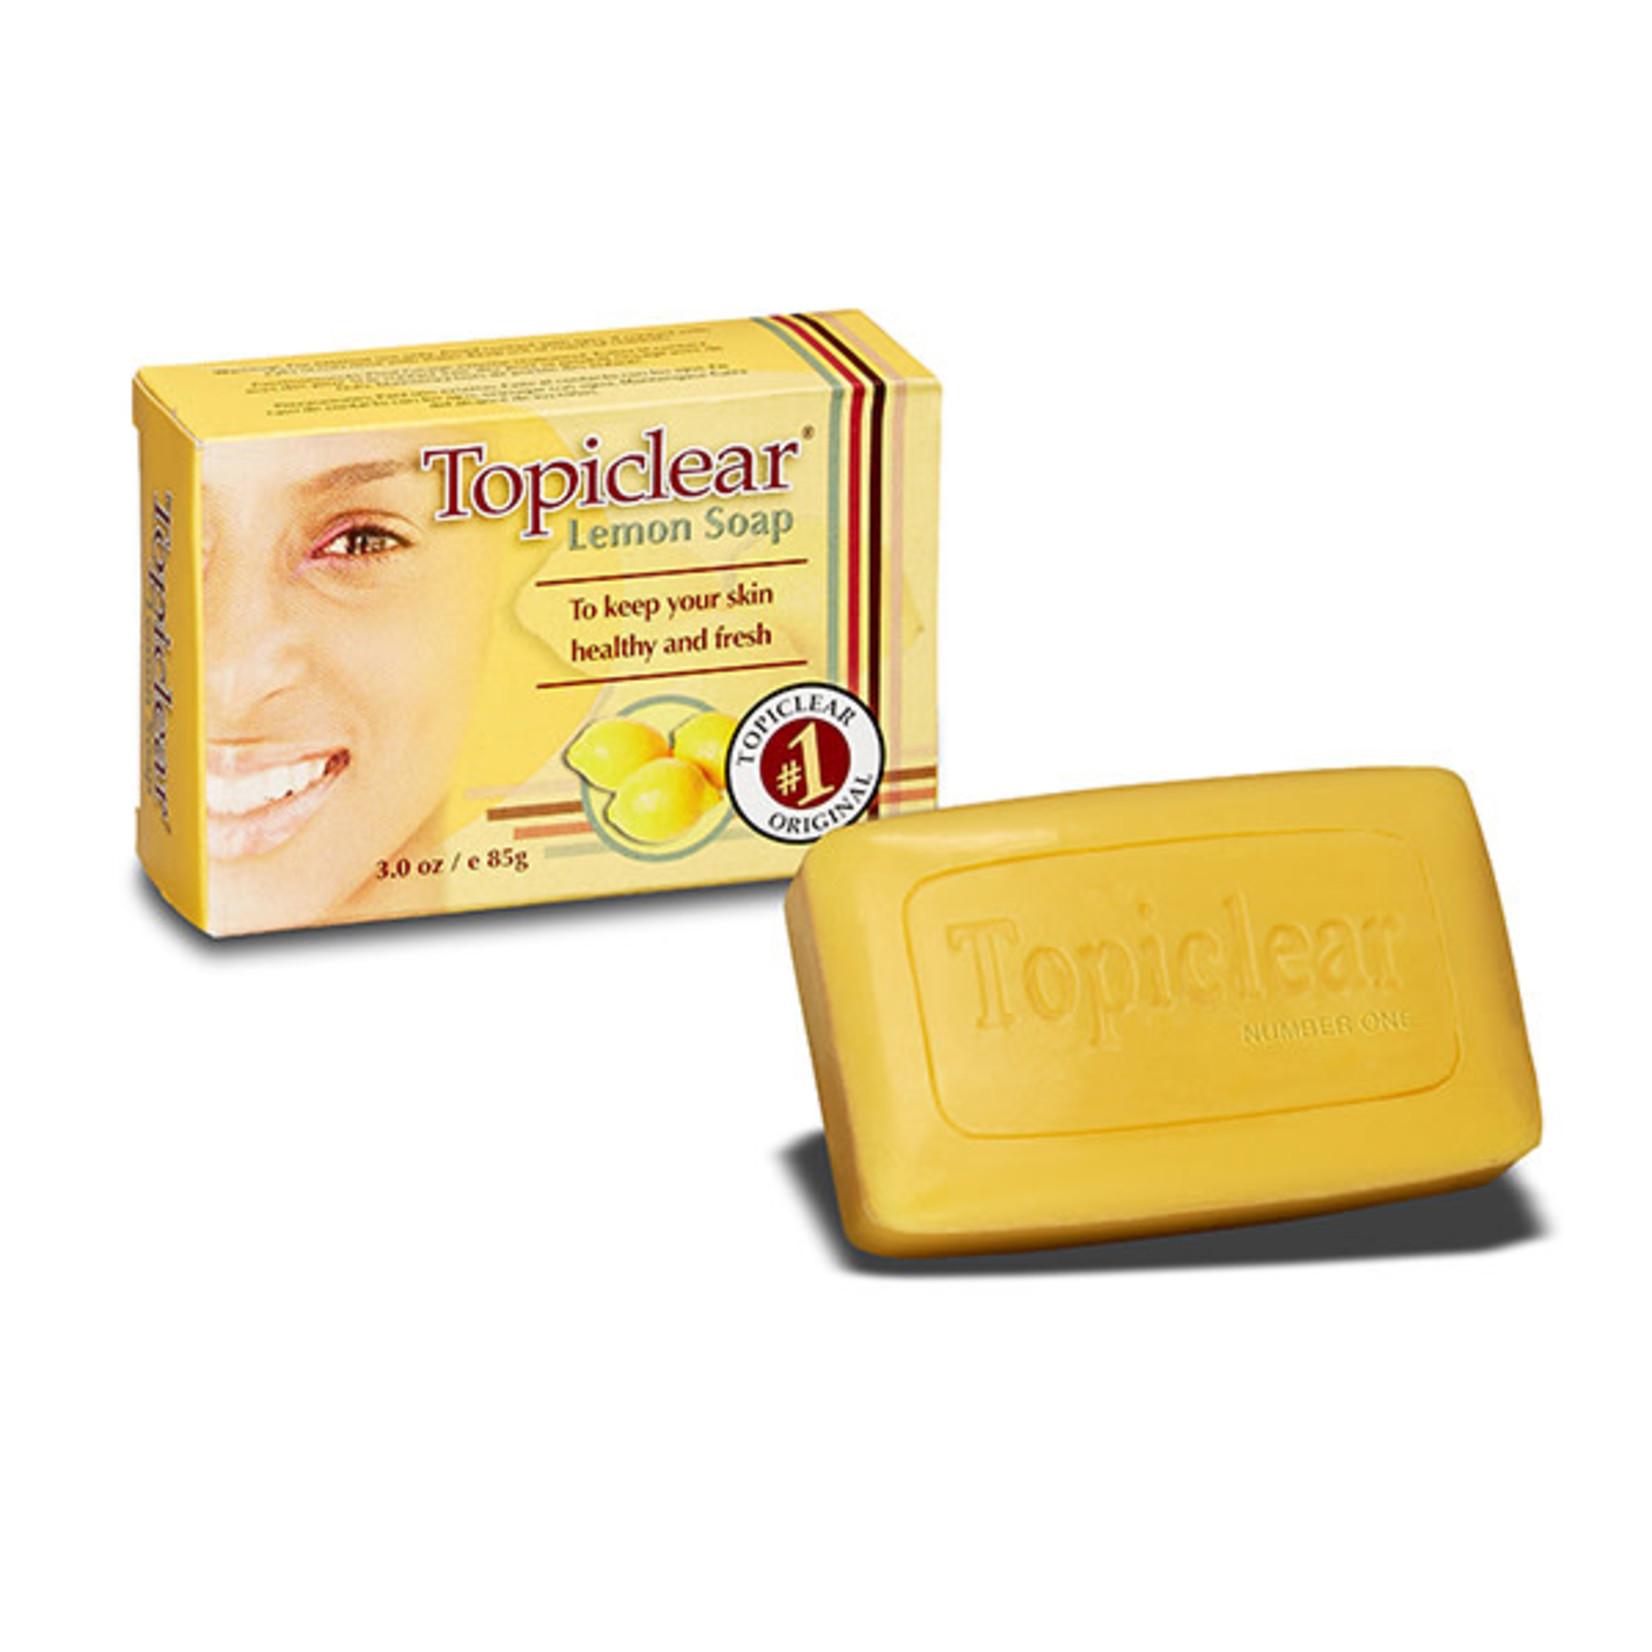 TOPICLEAR TOPICLEAR LEMON SOAP